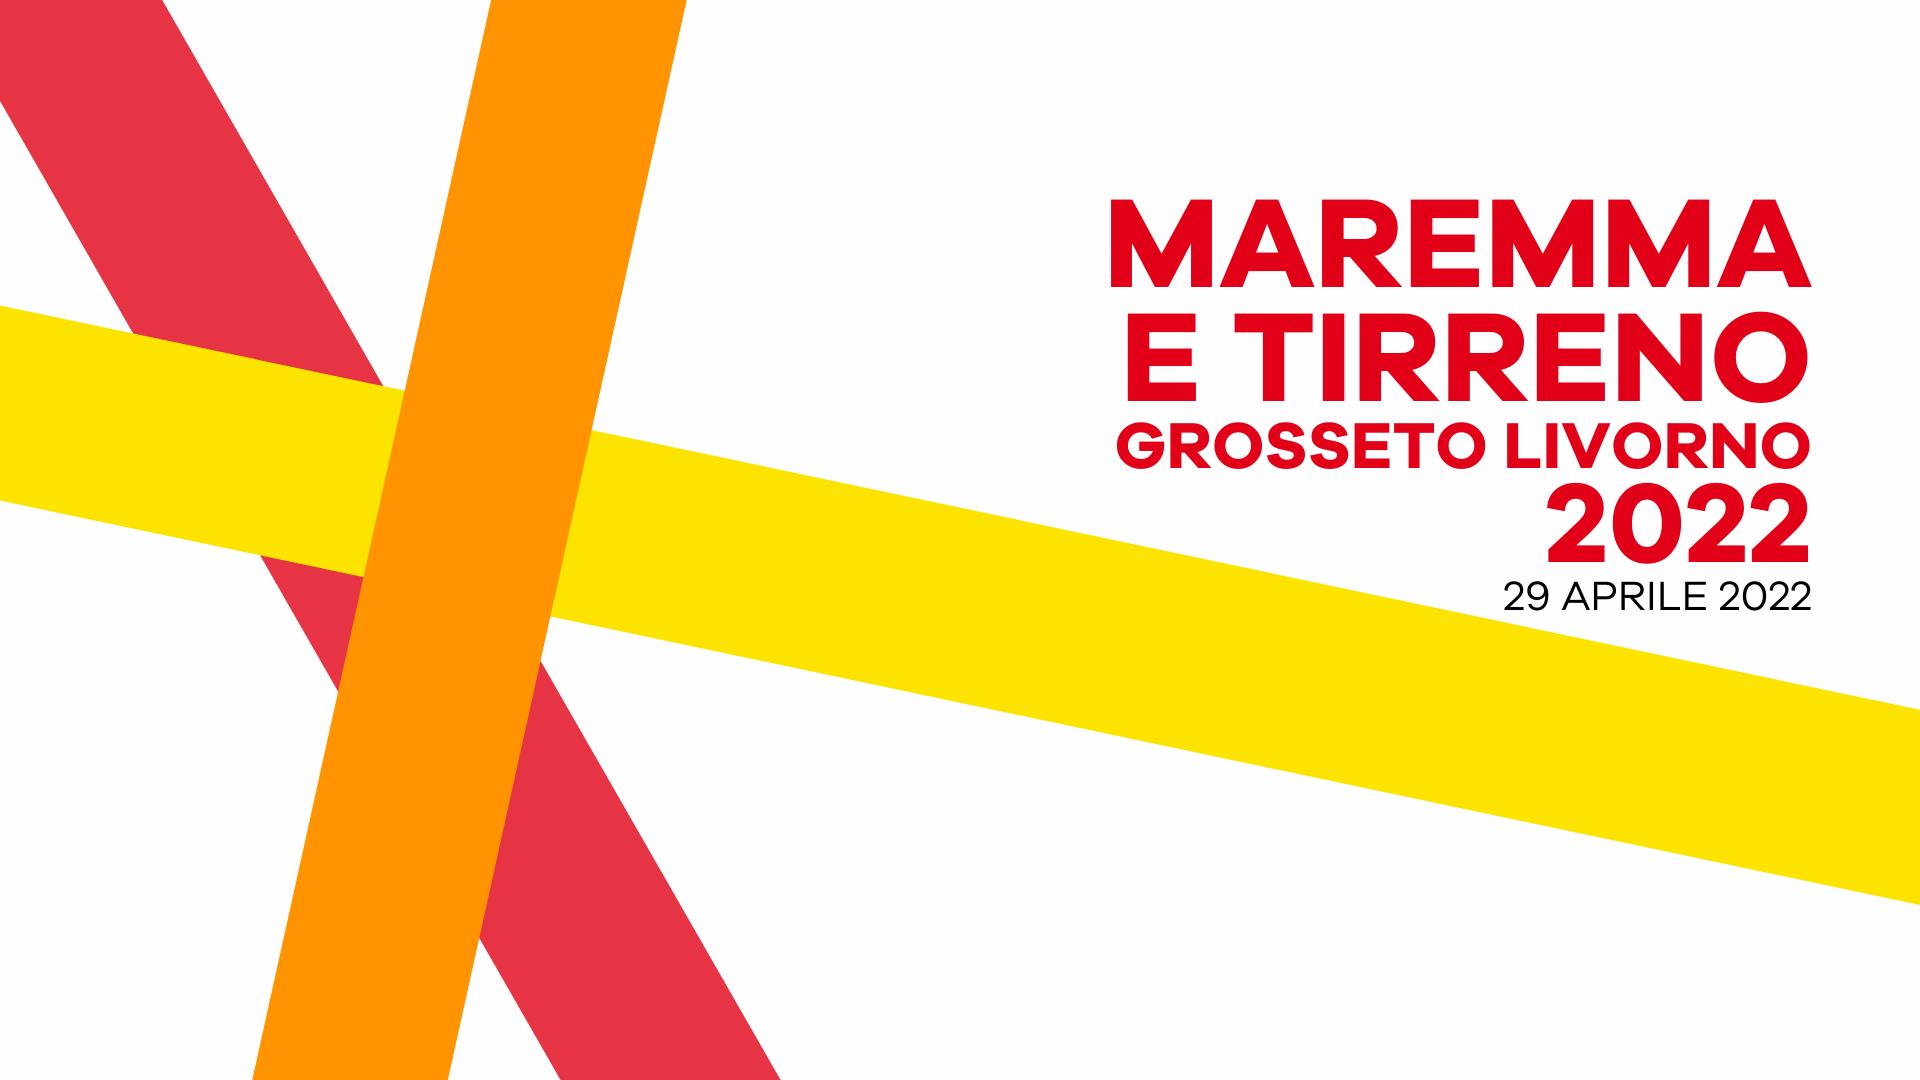 Maremma e Tirreno 2022 Online